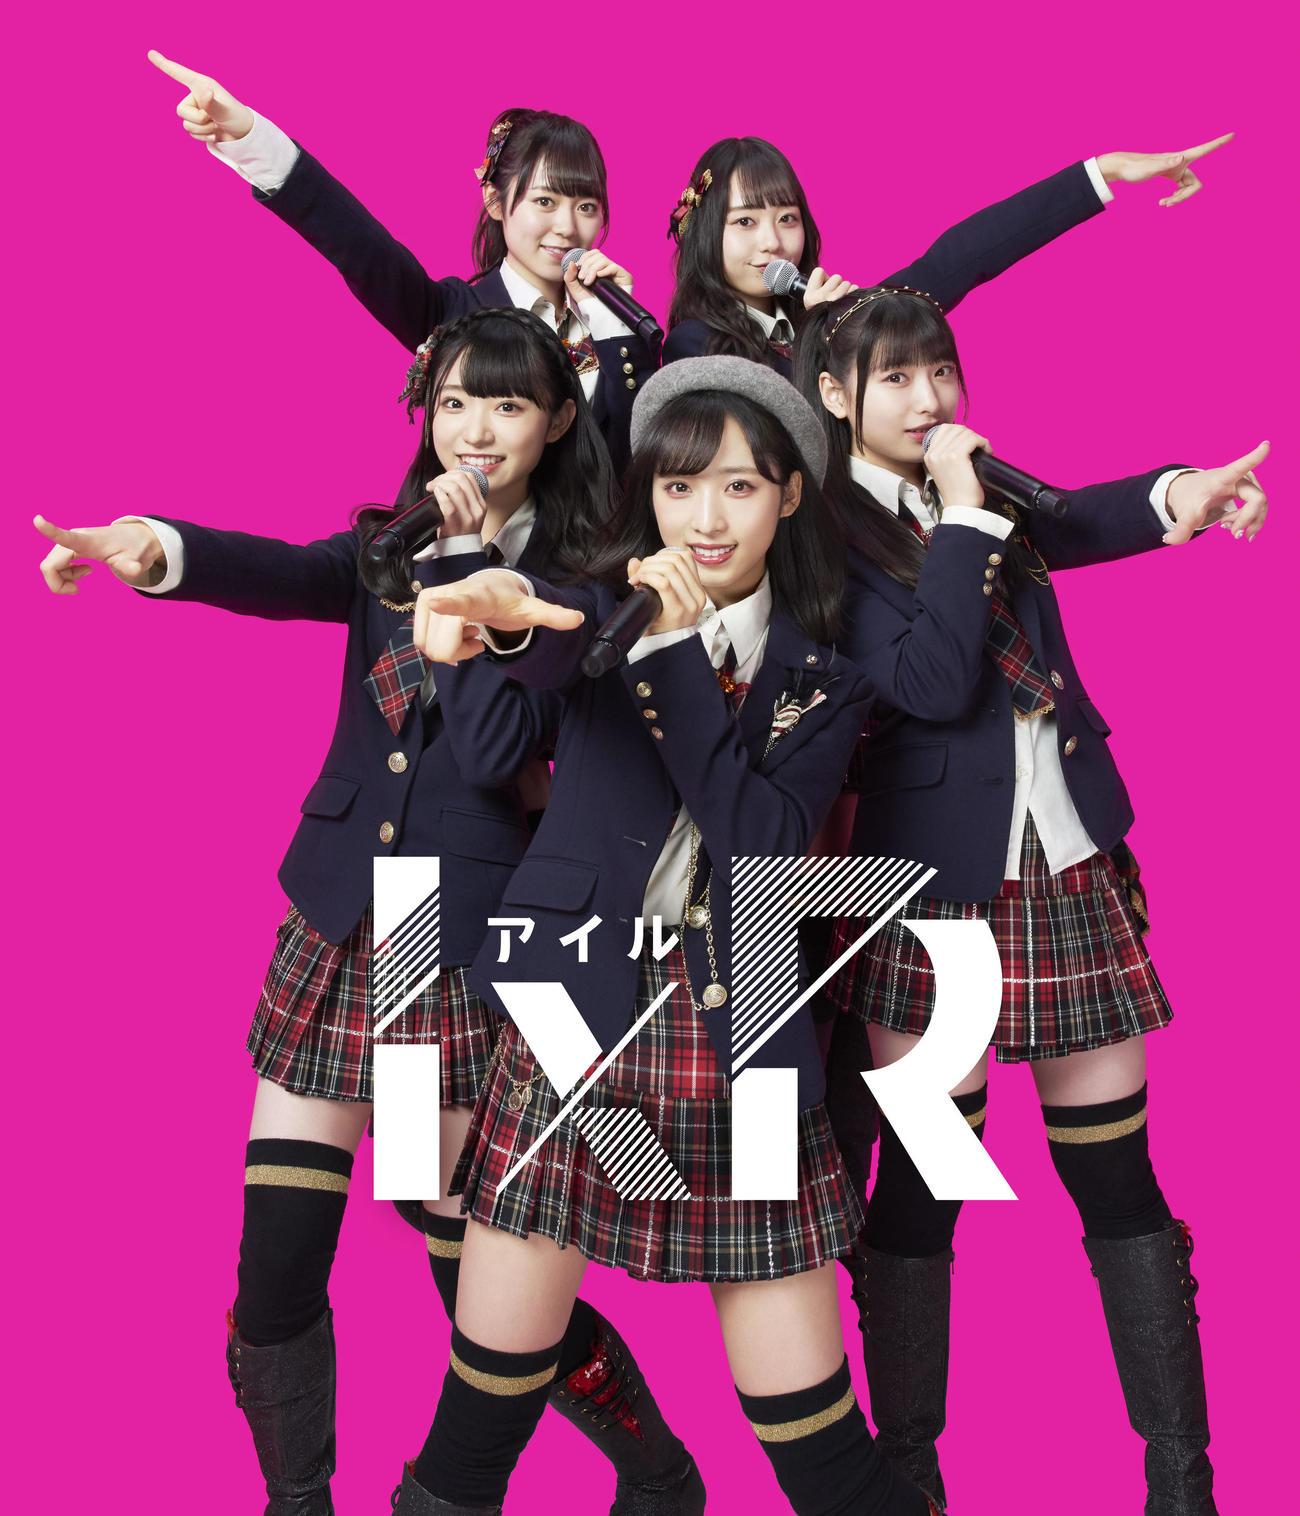 「VR SQUARE」とのコラボキャンペーンを実施中のAKB48の新ユニット「I×R」。前列左から山内瑞葵、小栗有以、久保怜音、後列左から西川怜、大盛真歩(C)AKB48